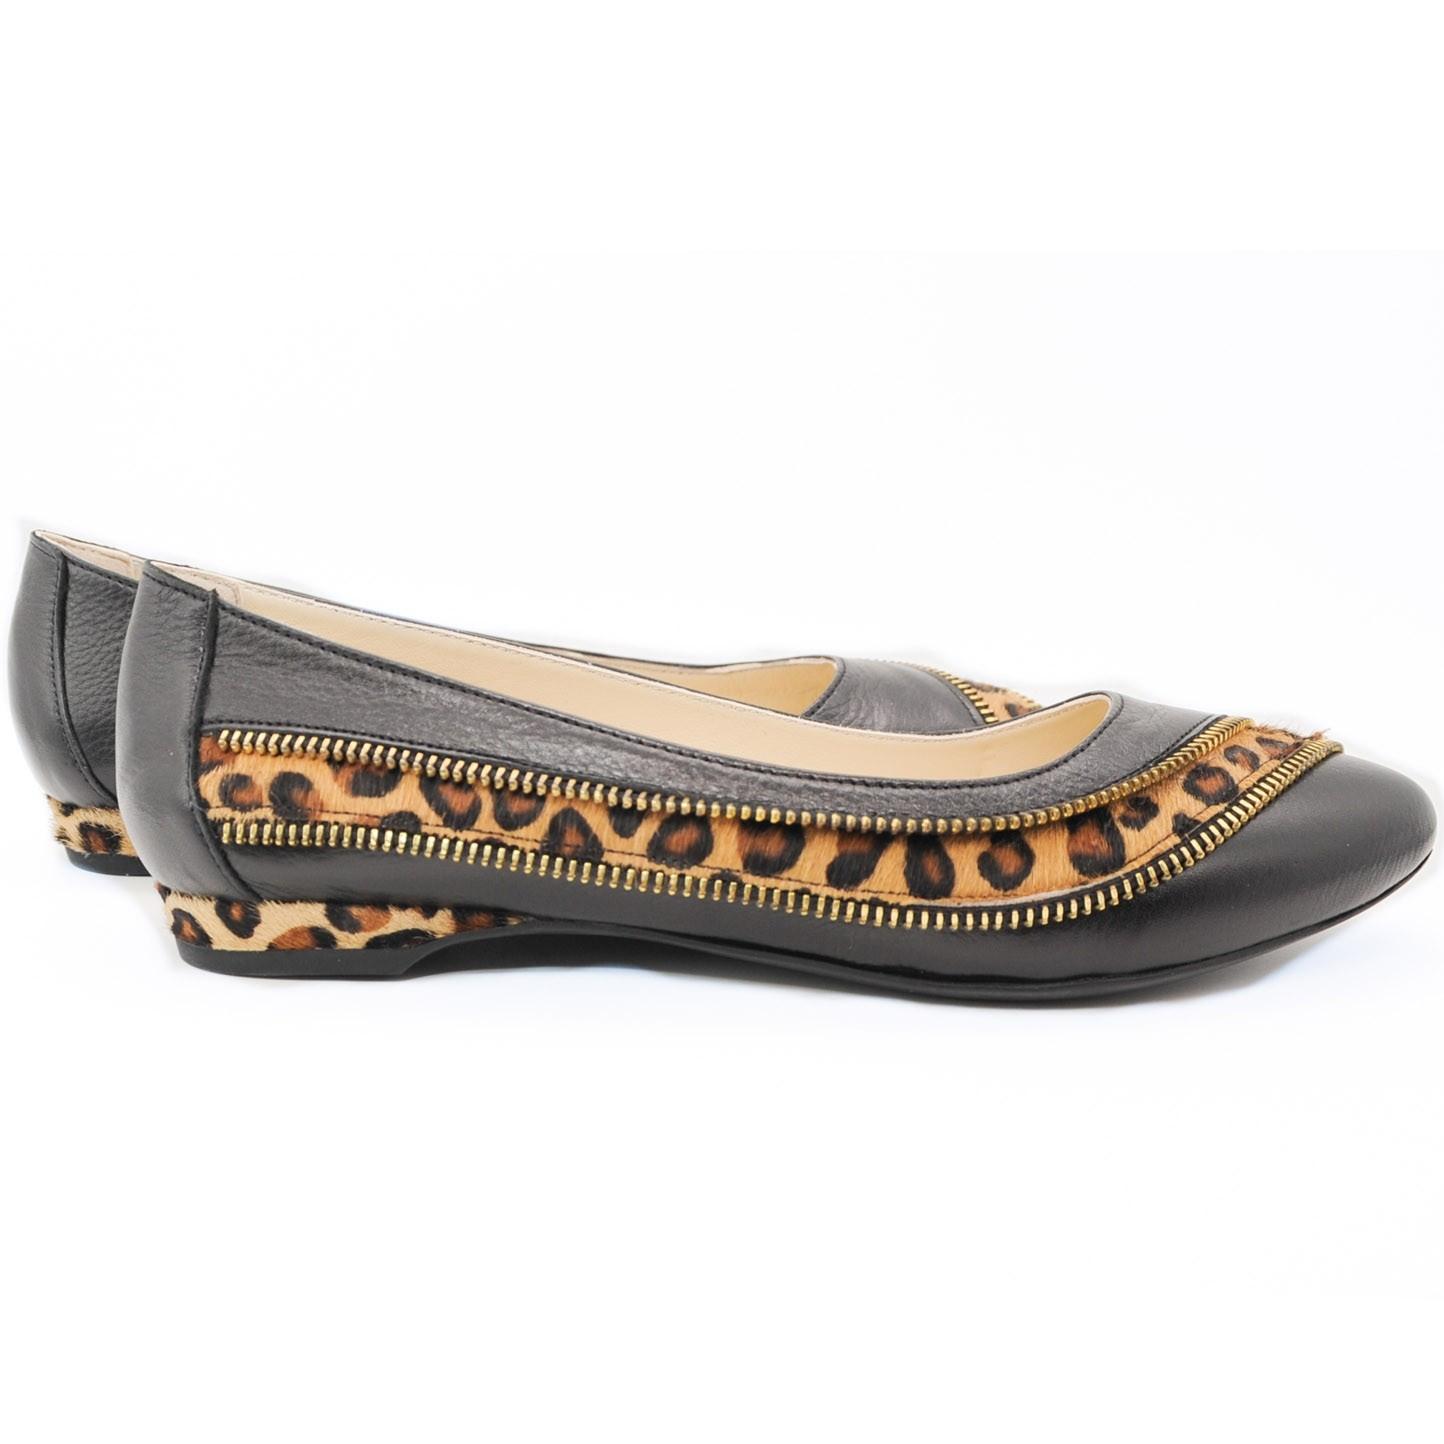 Leather Ballerina with Zip Leopard Strip Overlay Slip On Flats